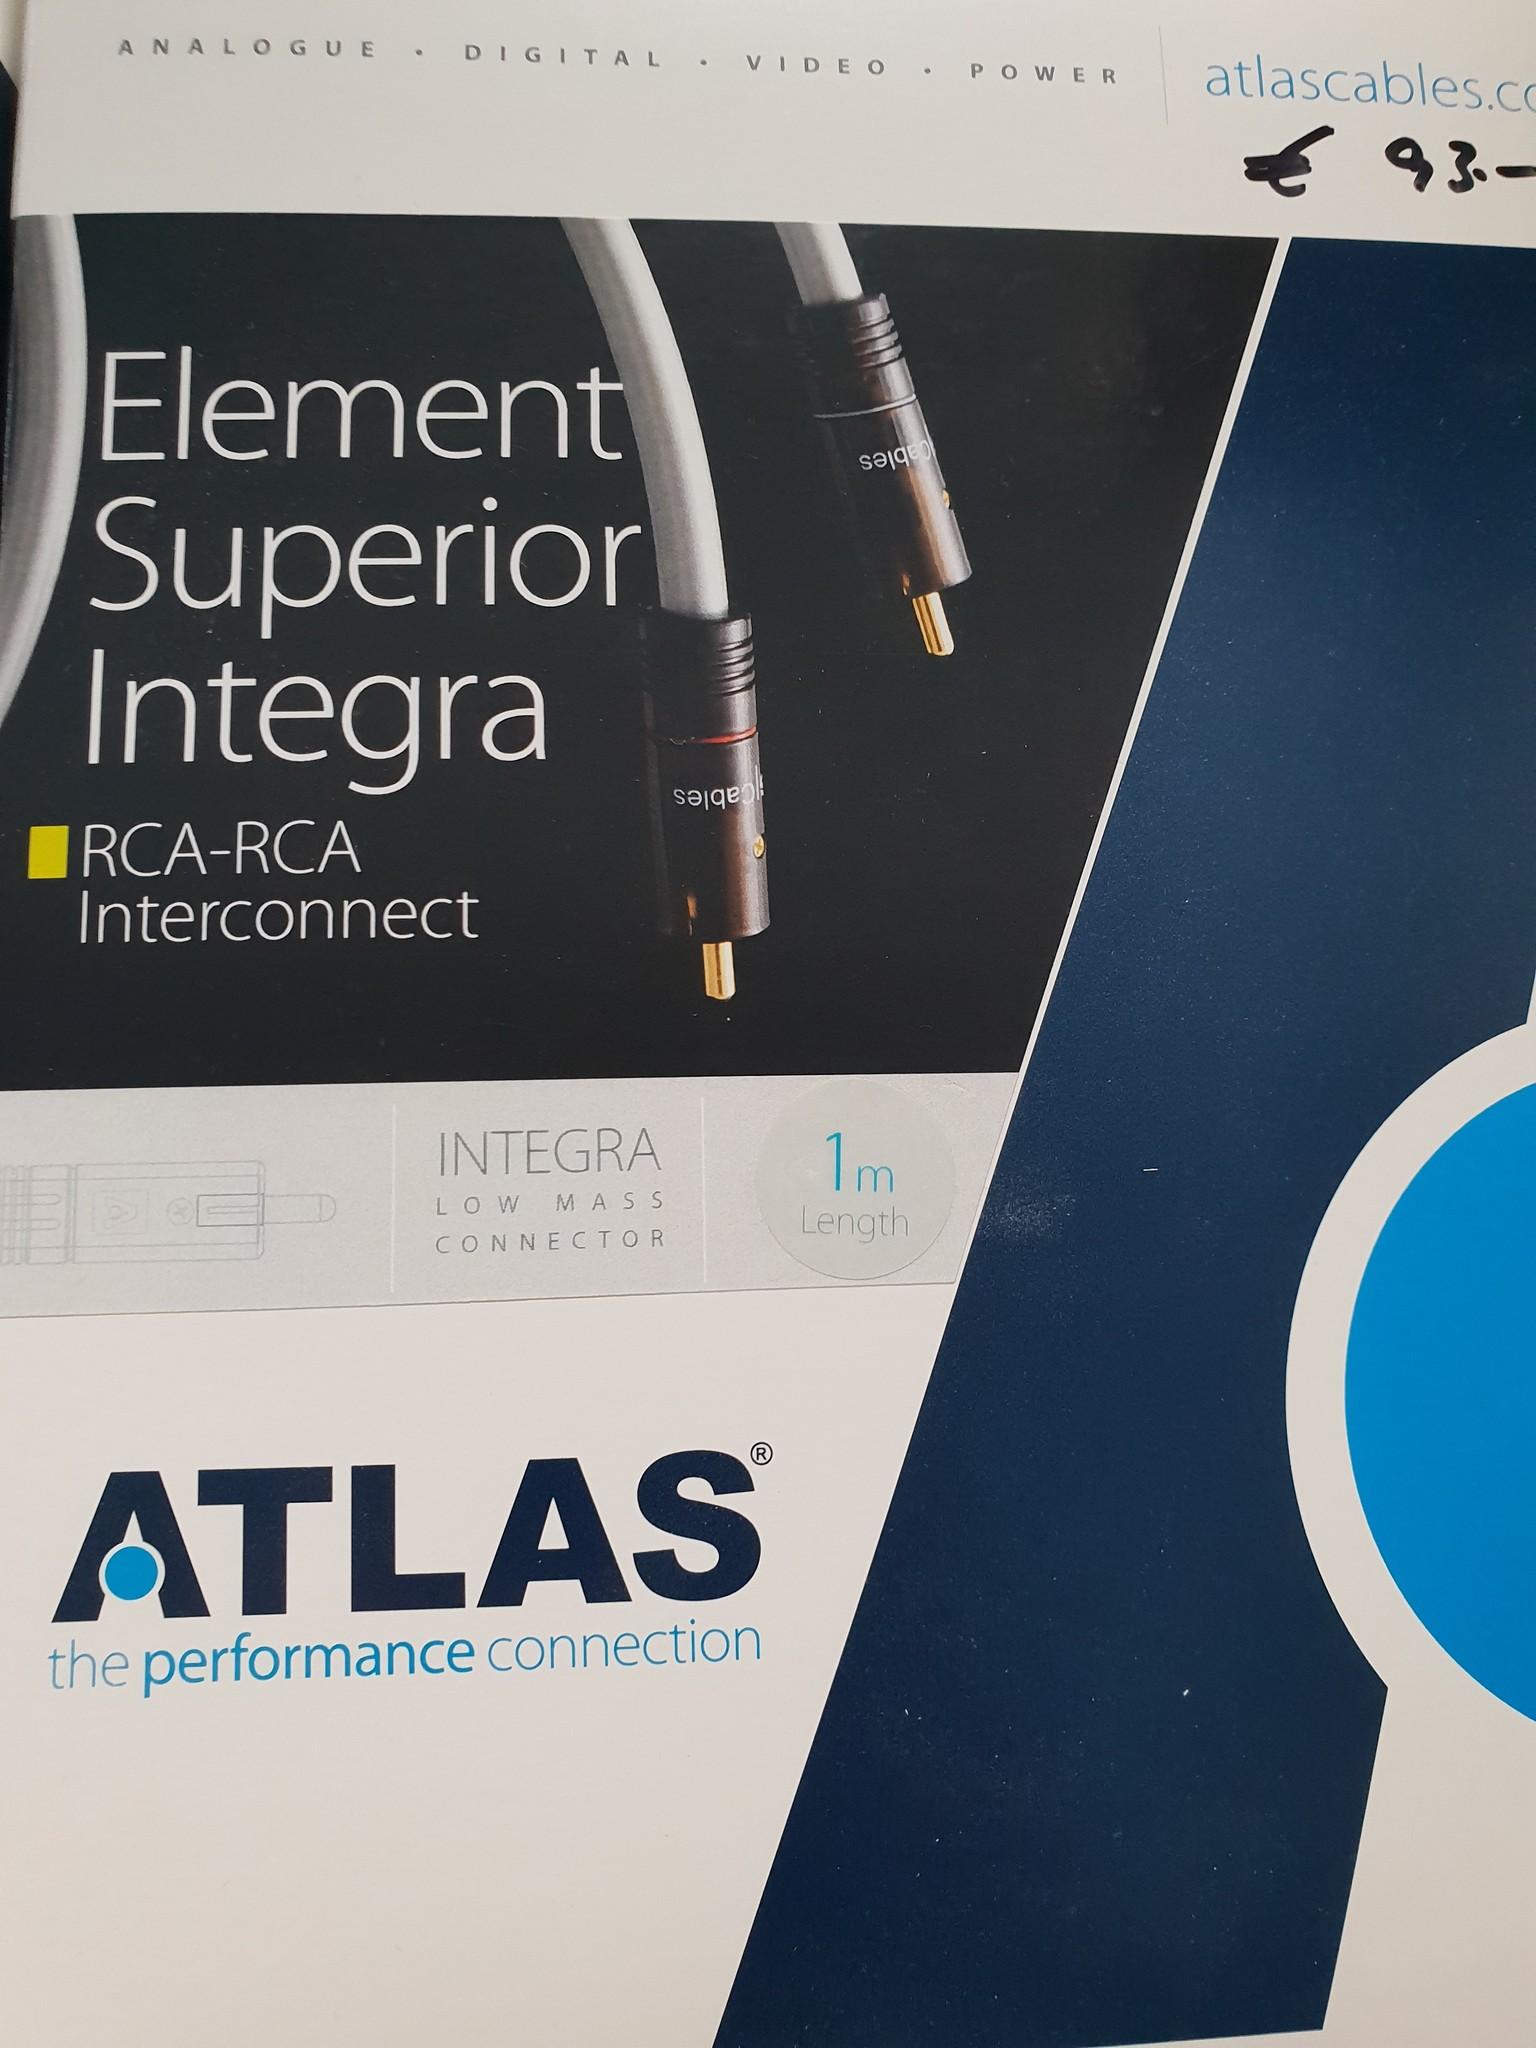 Atlas Atlas Element Superior Integra RCA-RCA Interconnect 1m